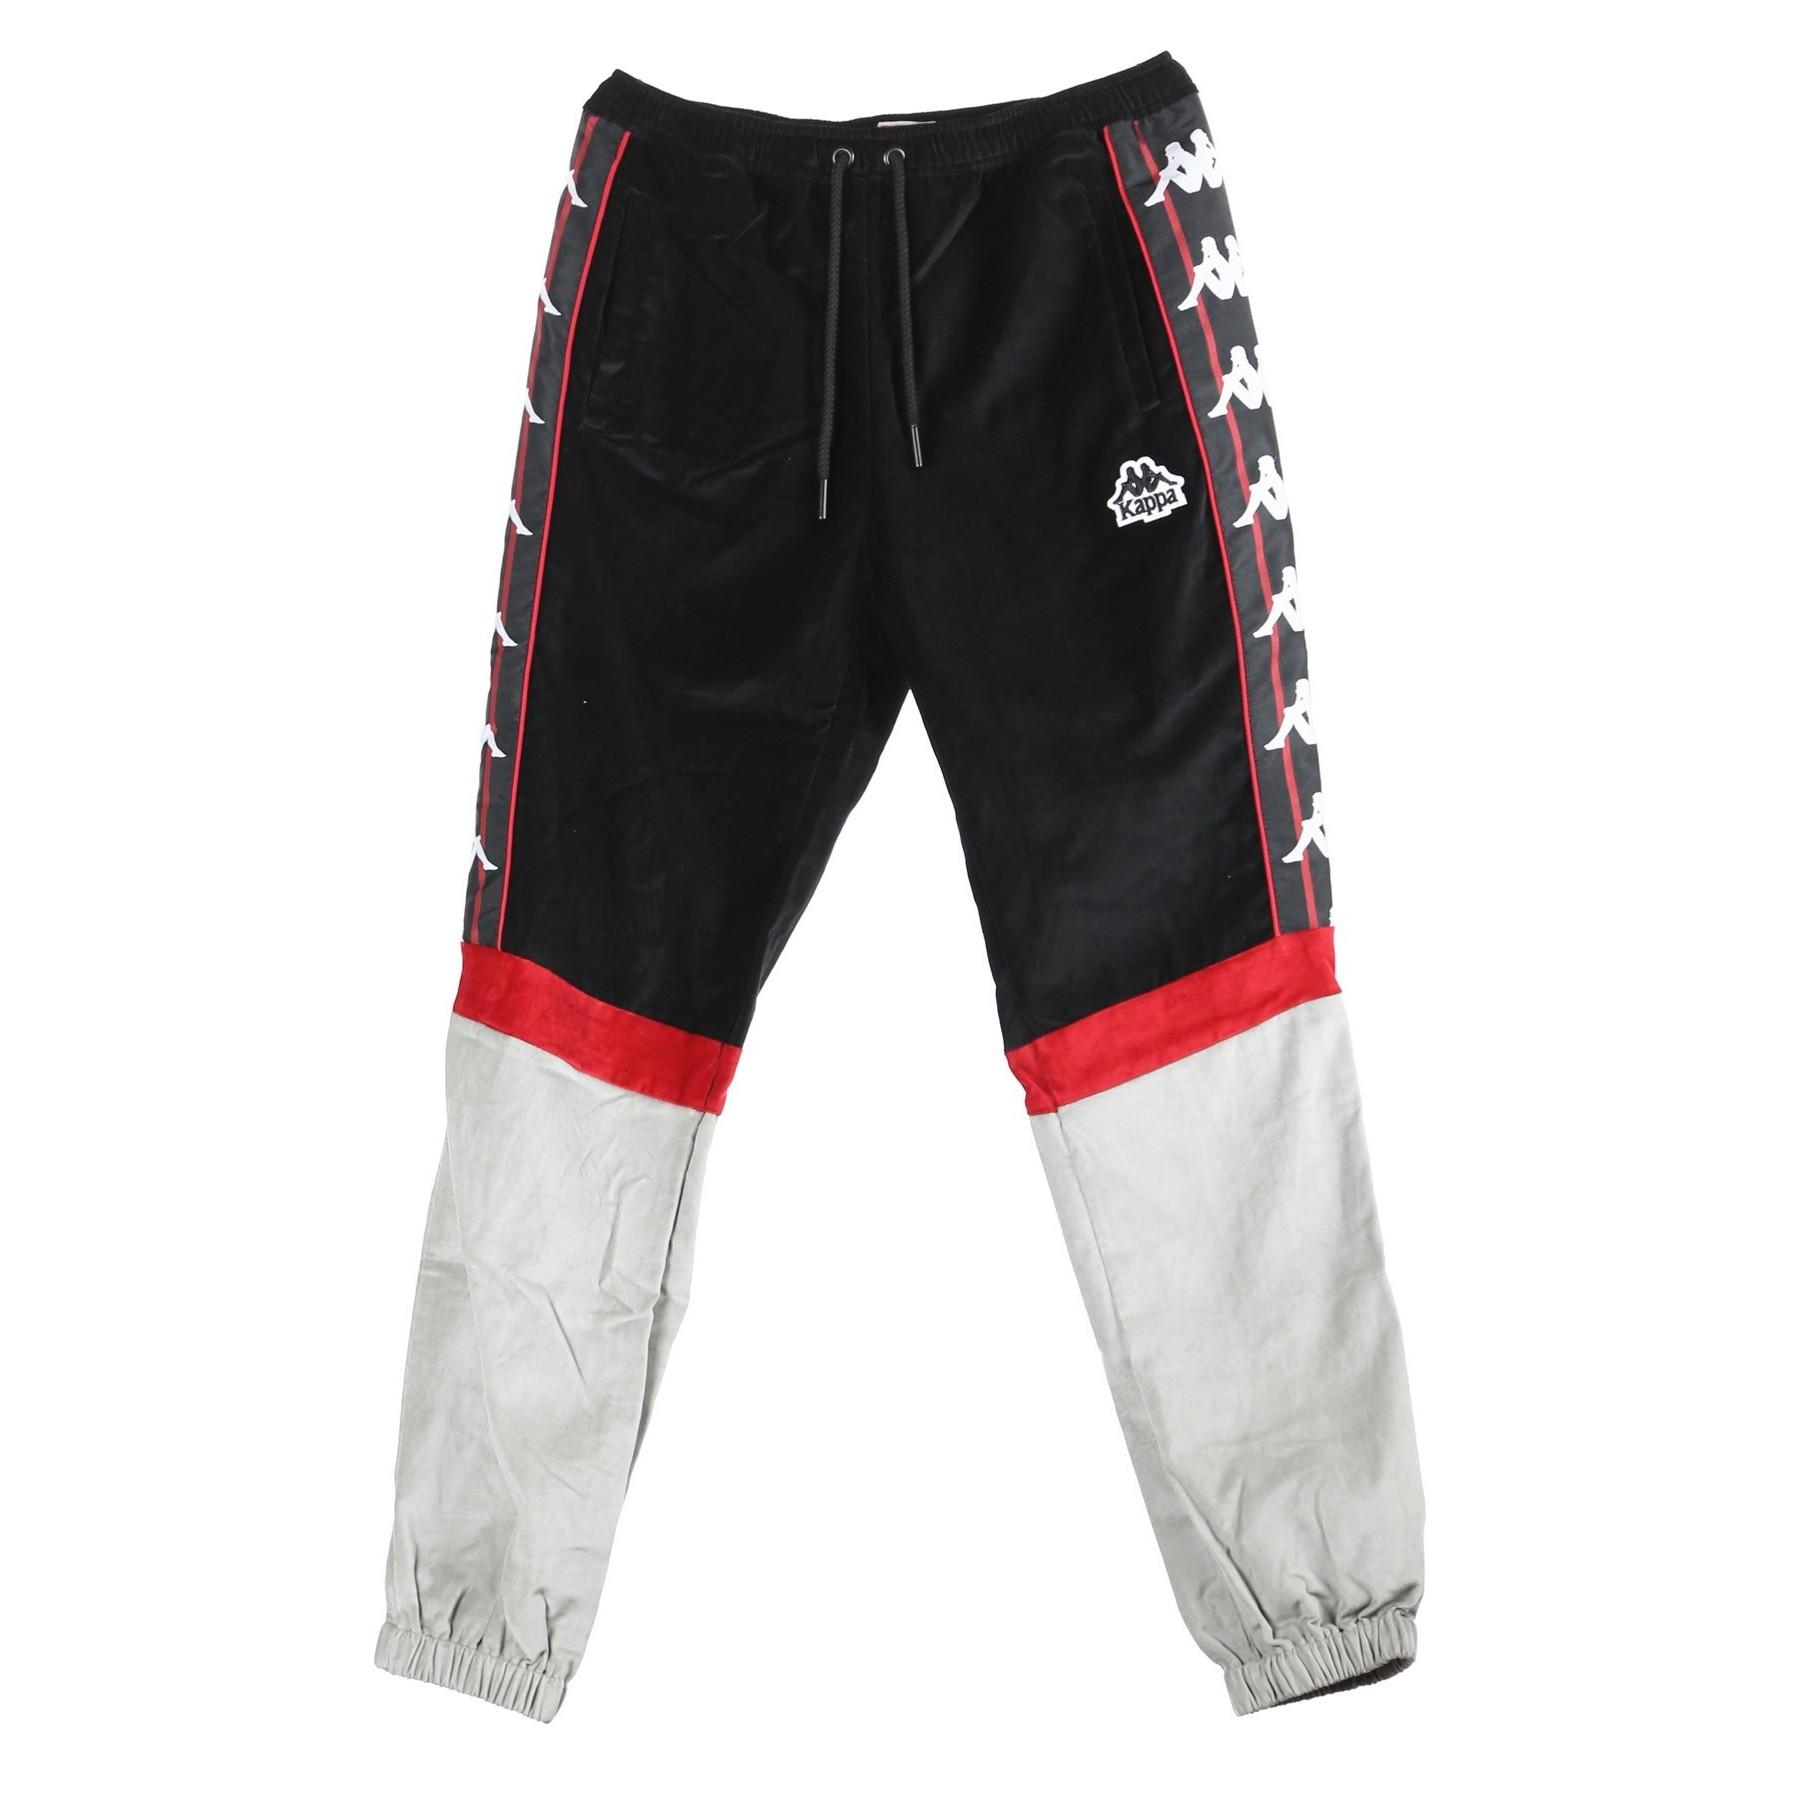 Kappa Authentic Pantaloni Uomo Serena